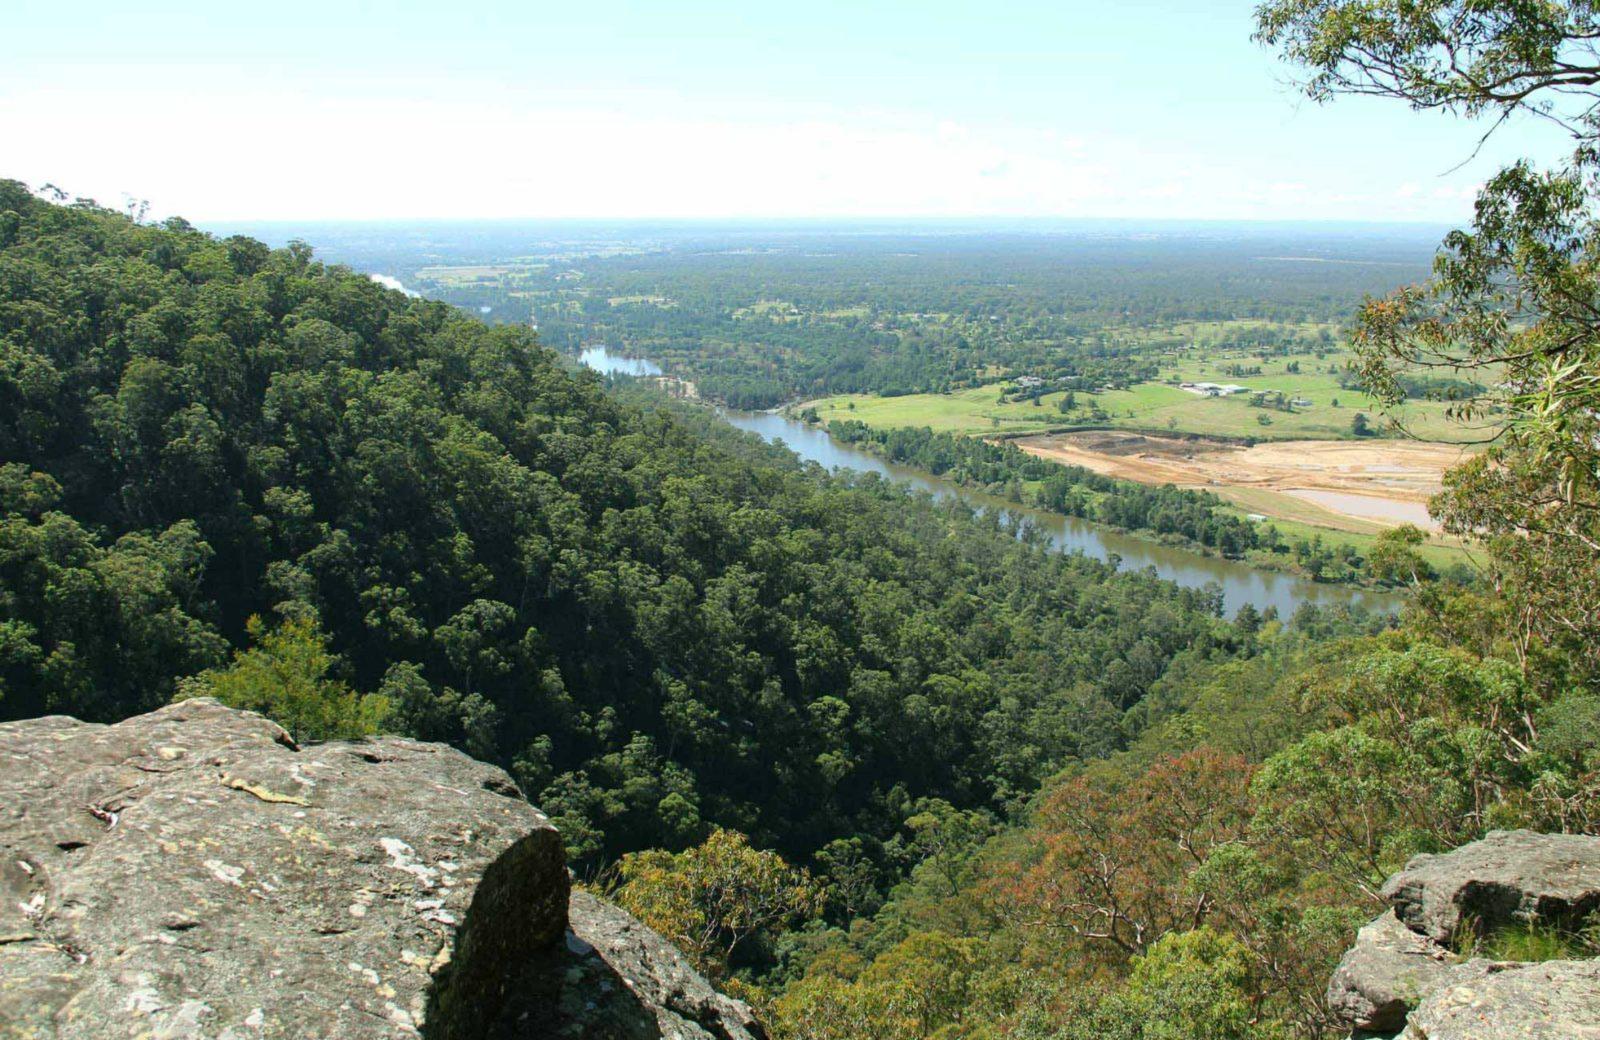 View from Yellow Rock lookout, Yellomundee Regional Park. Photo: John Yurasek